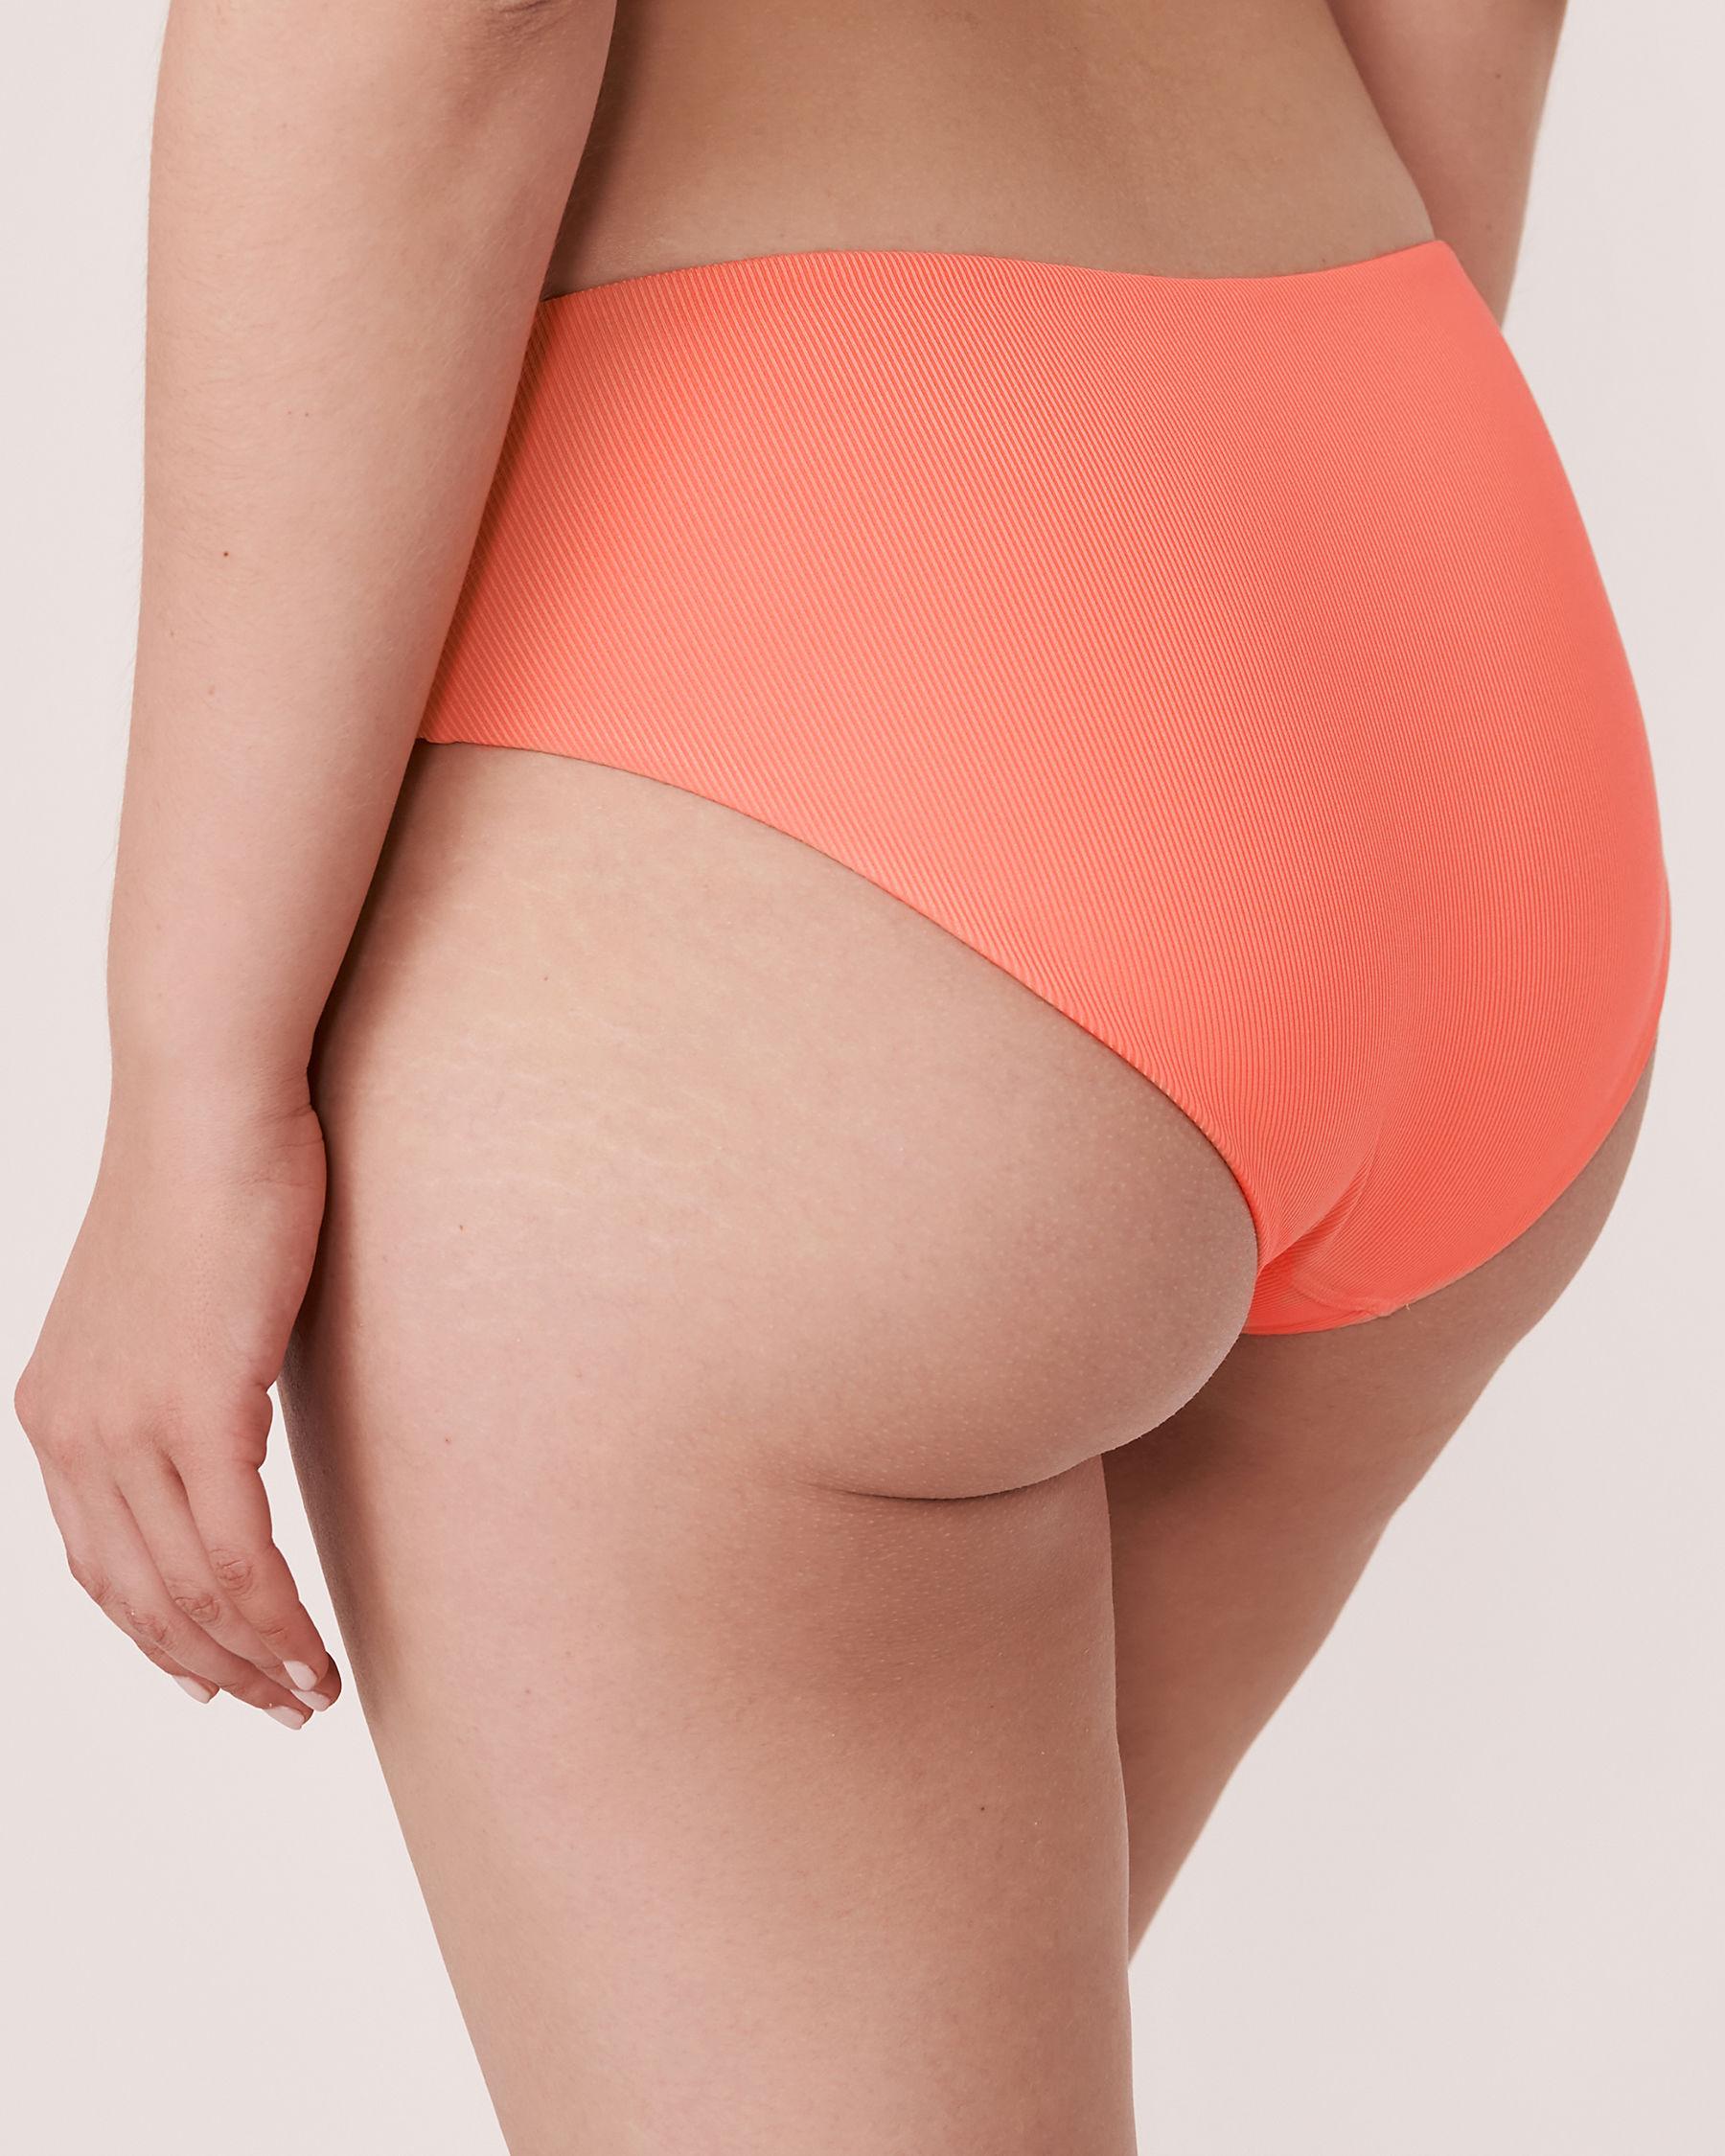 AQUAROSE Bas de bikini hipster en fibres recyclées SOLID RIB Corail 70300051 - Voir2